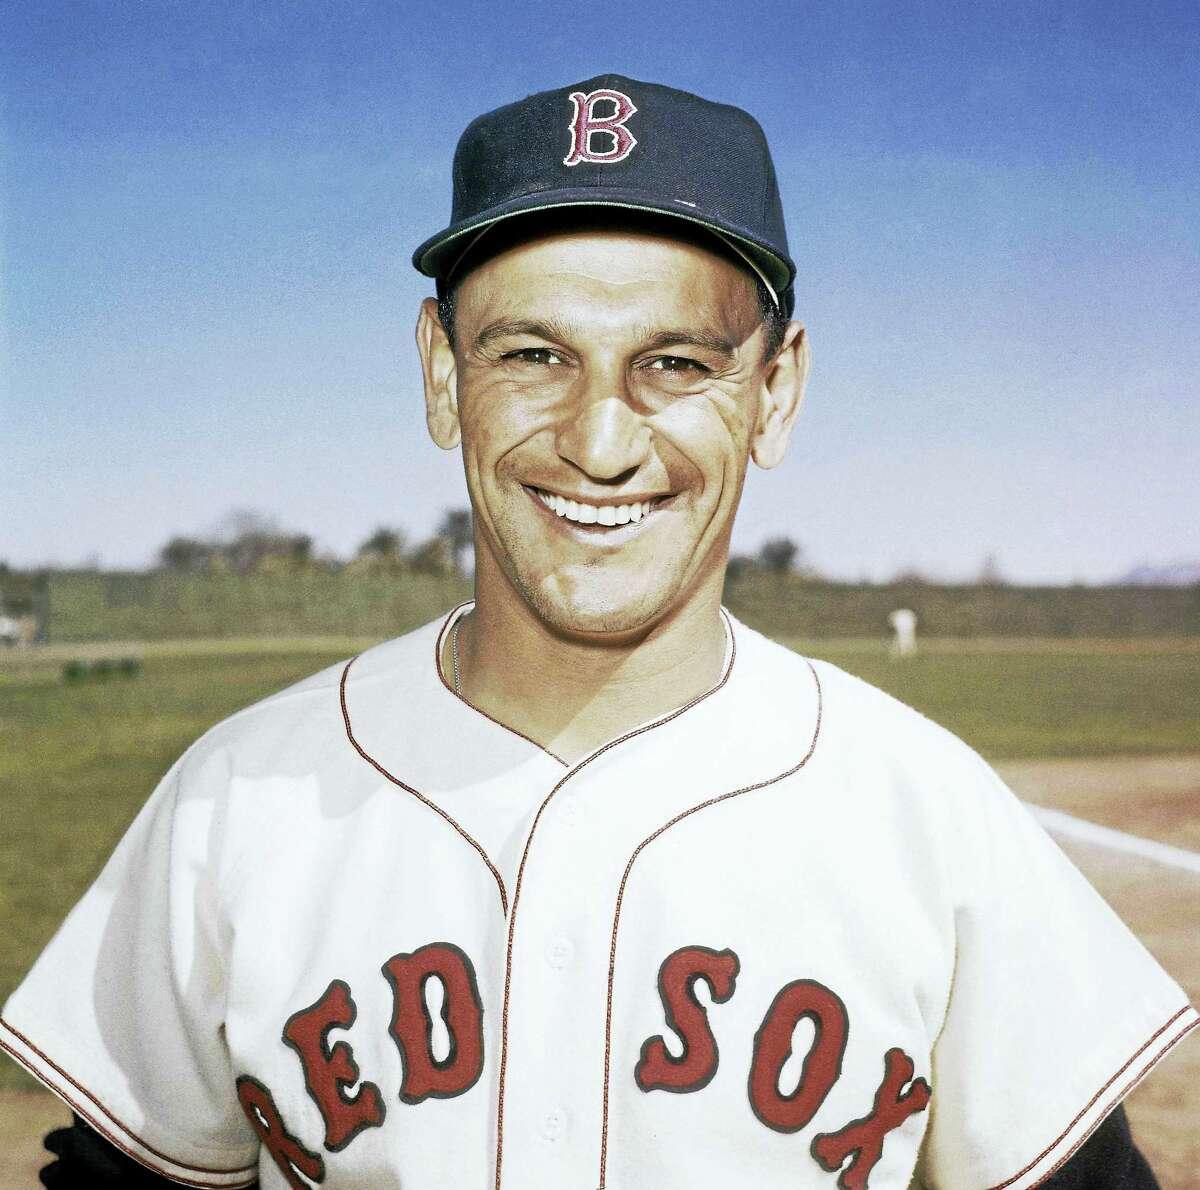 Former Boston Red Sox All-Star third baseman Frank Malzone died at 85.